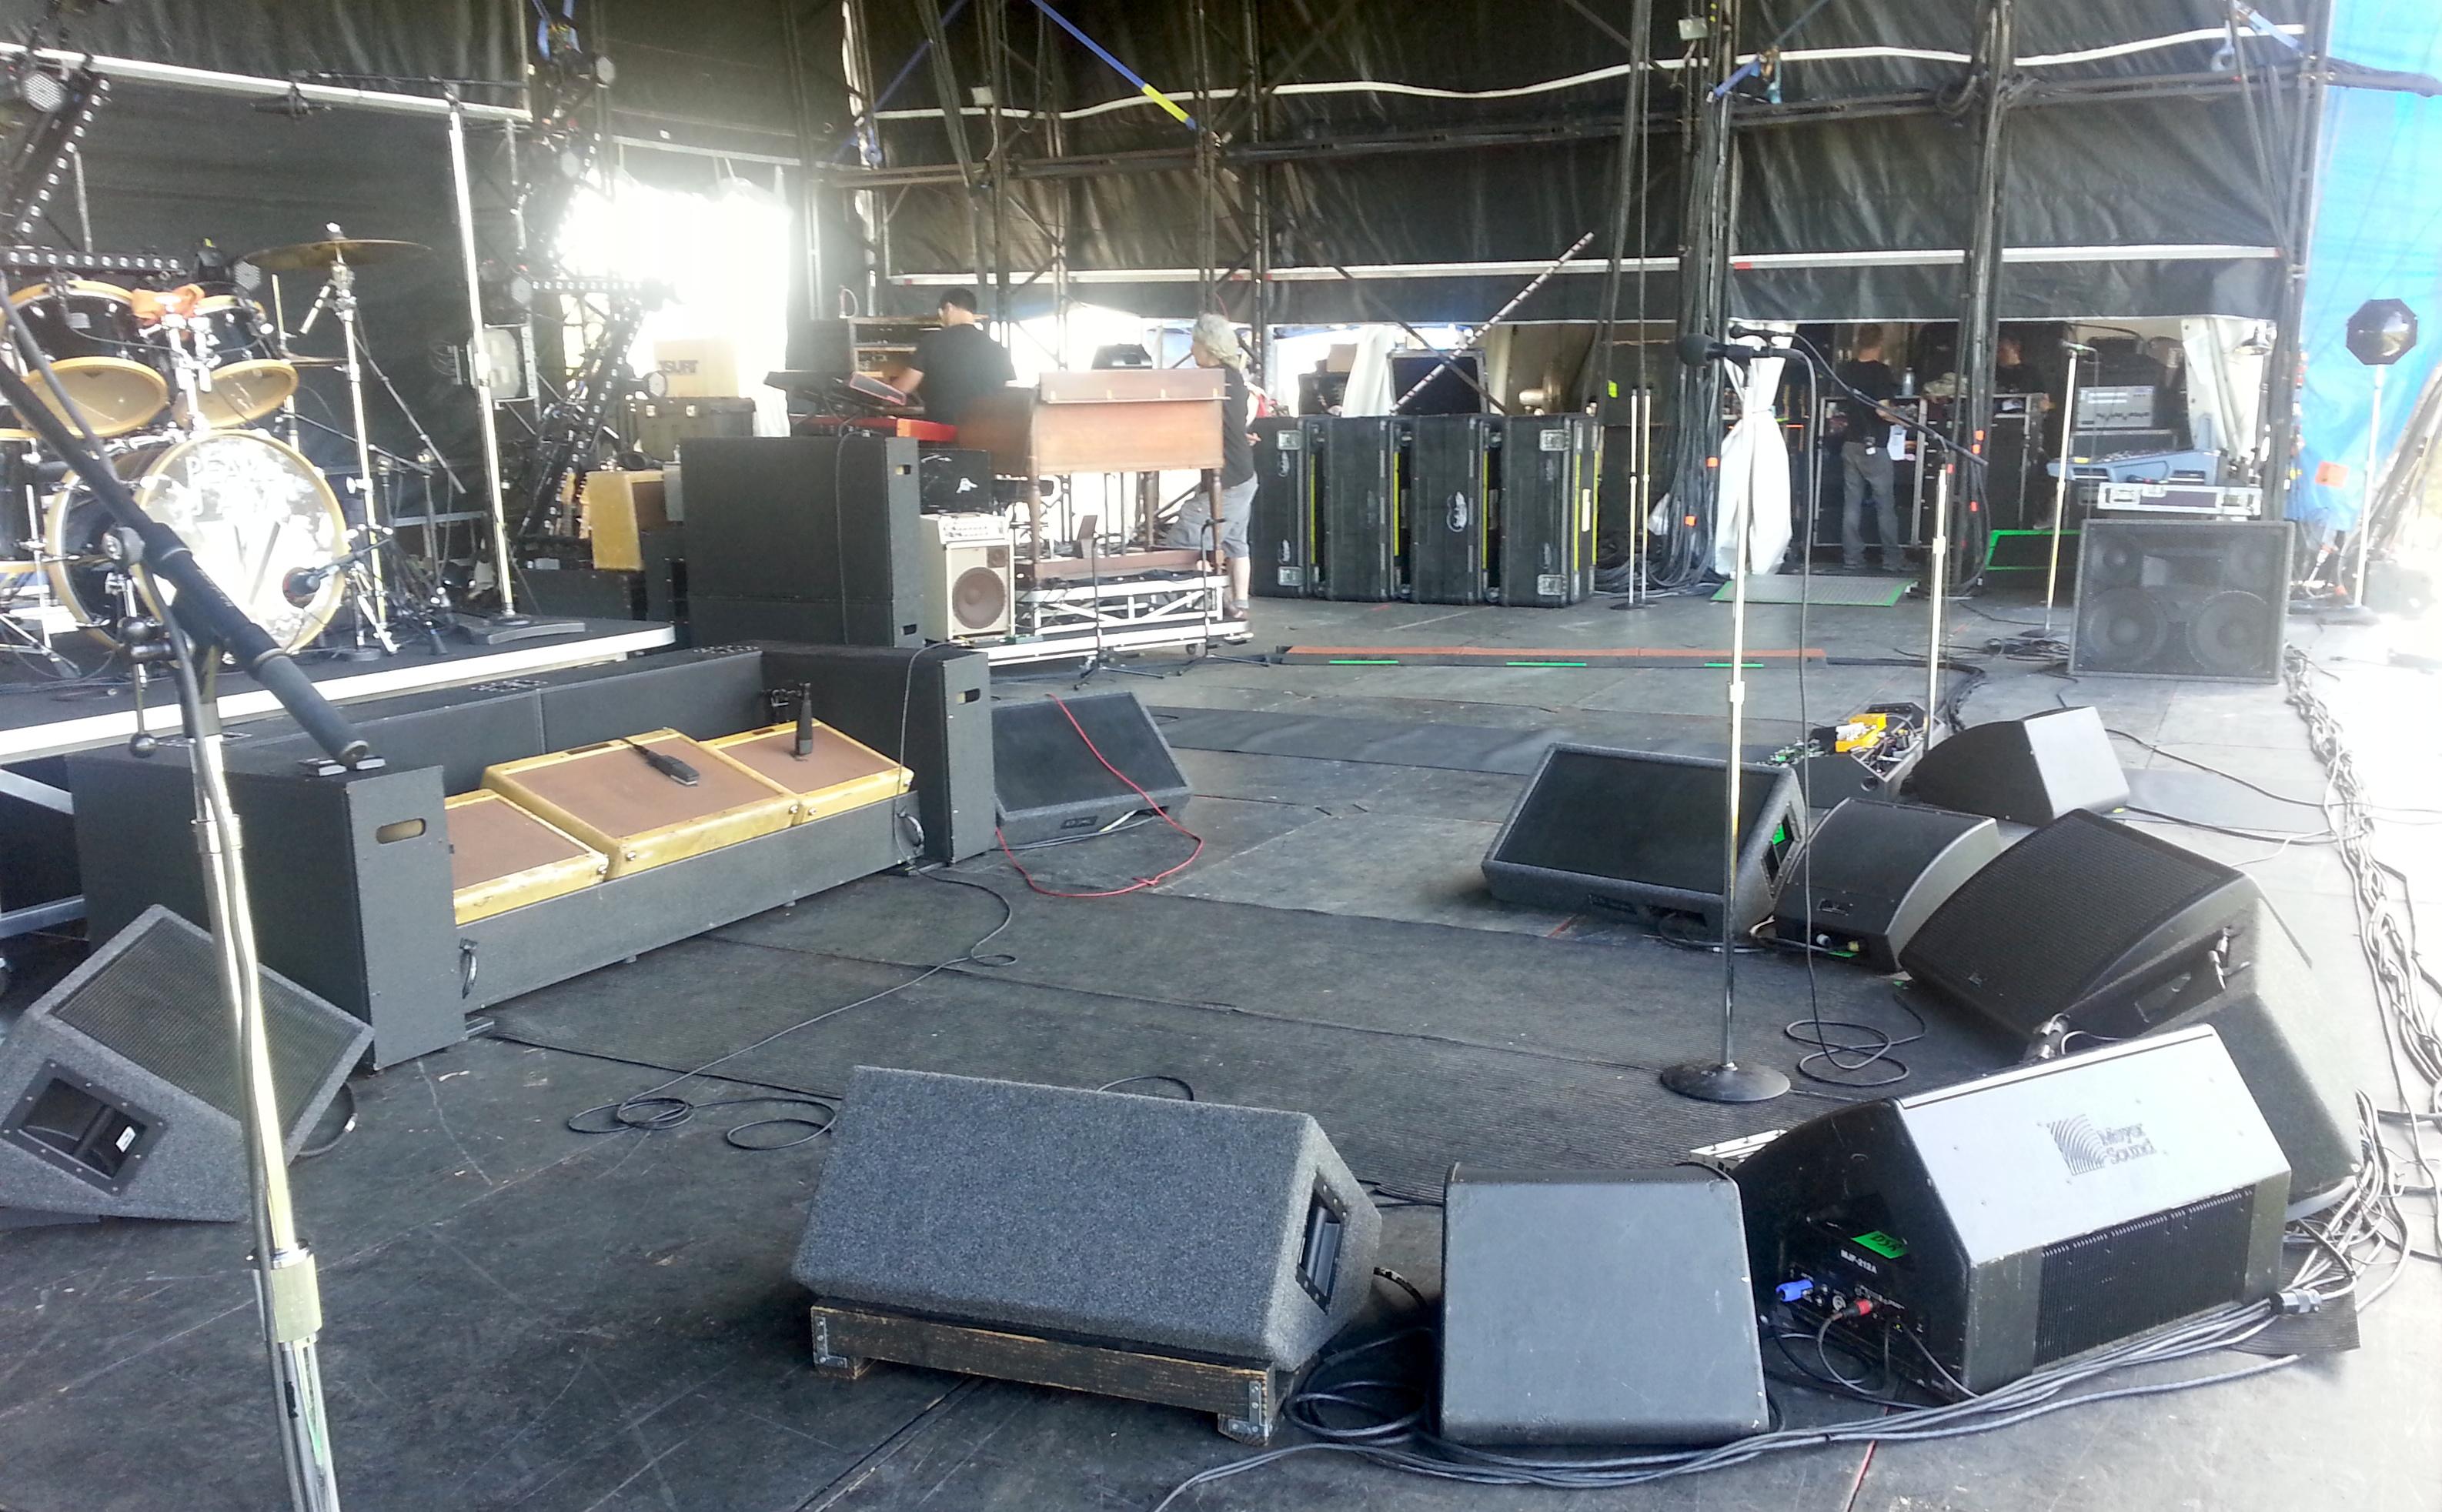 sound-engineer-career-advice-kerrie-keyes-michelle-pettinato-soundgirls-stage-monitors-eddie-vedder